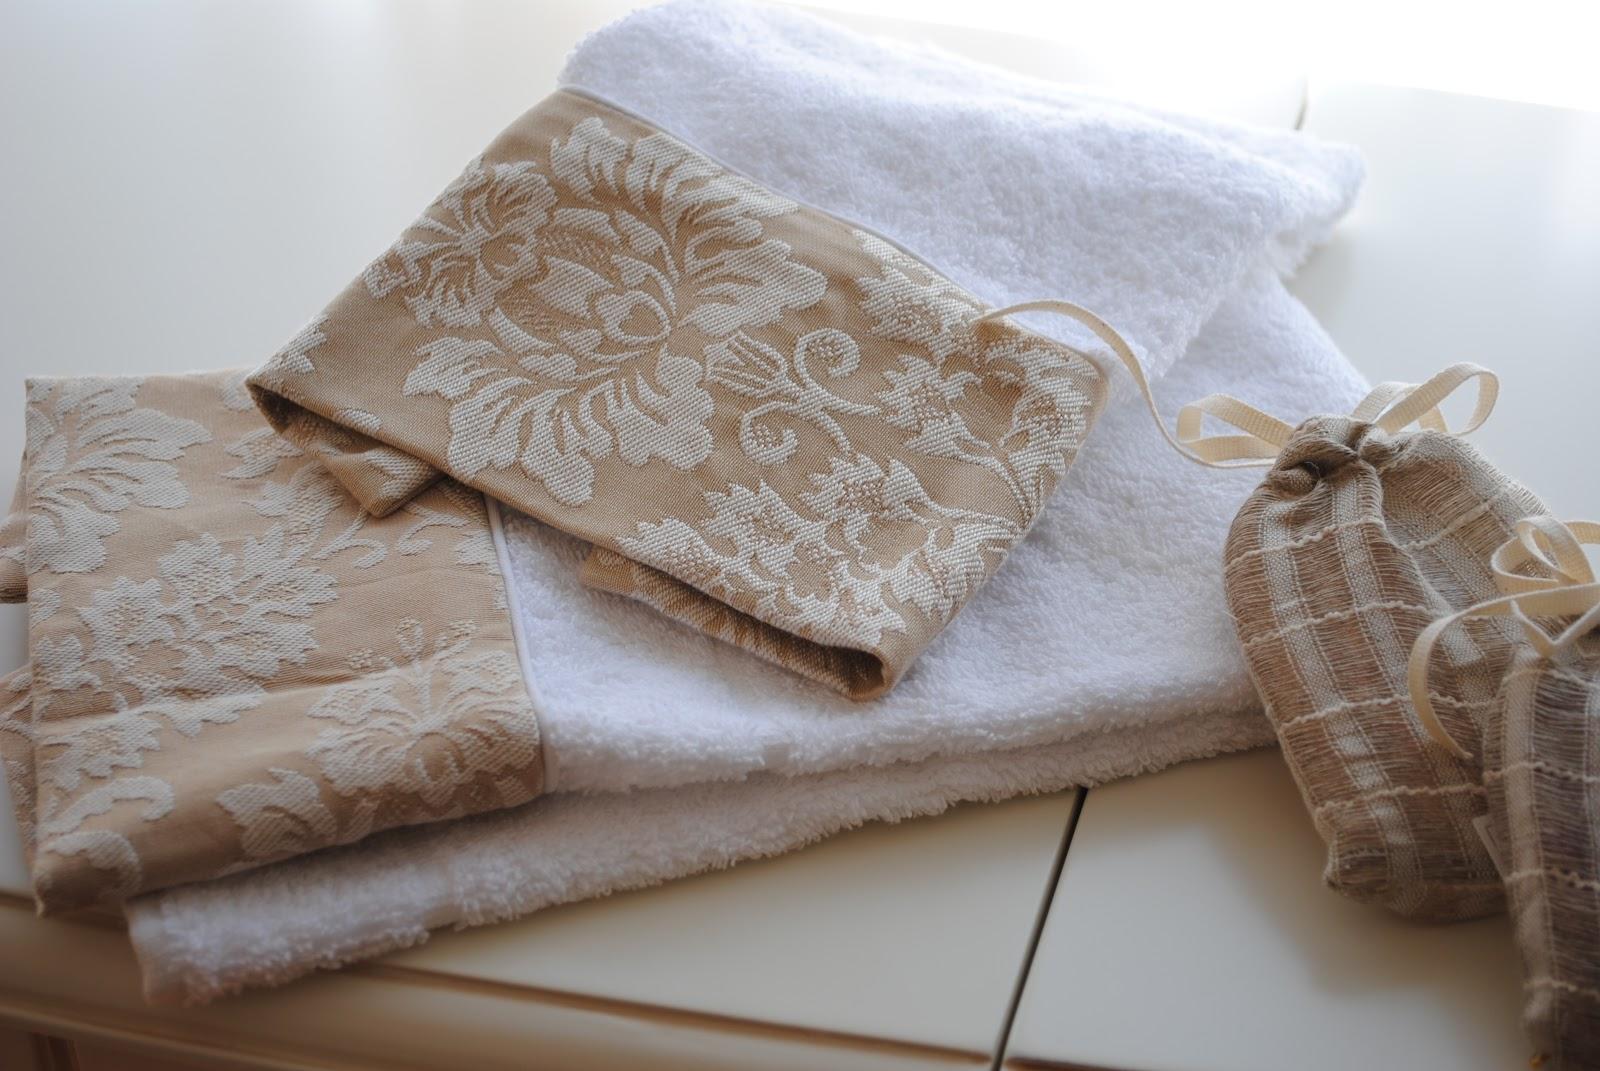 Paz montealegre decoraci n toallas cortinas de ba o - Toallas de bano baratas ...